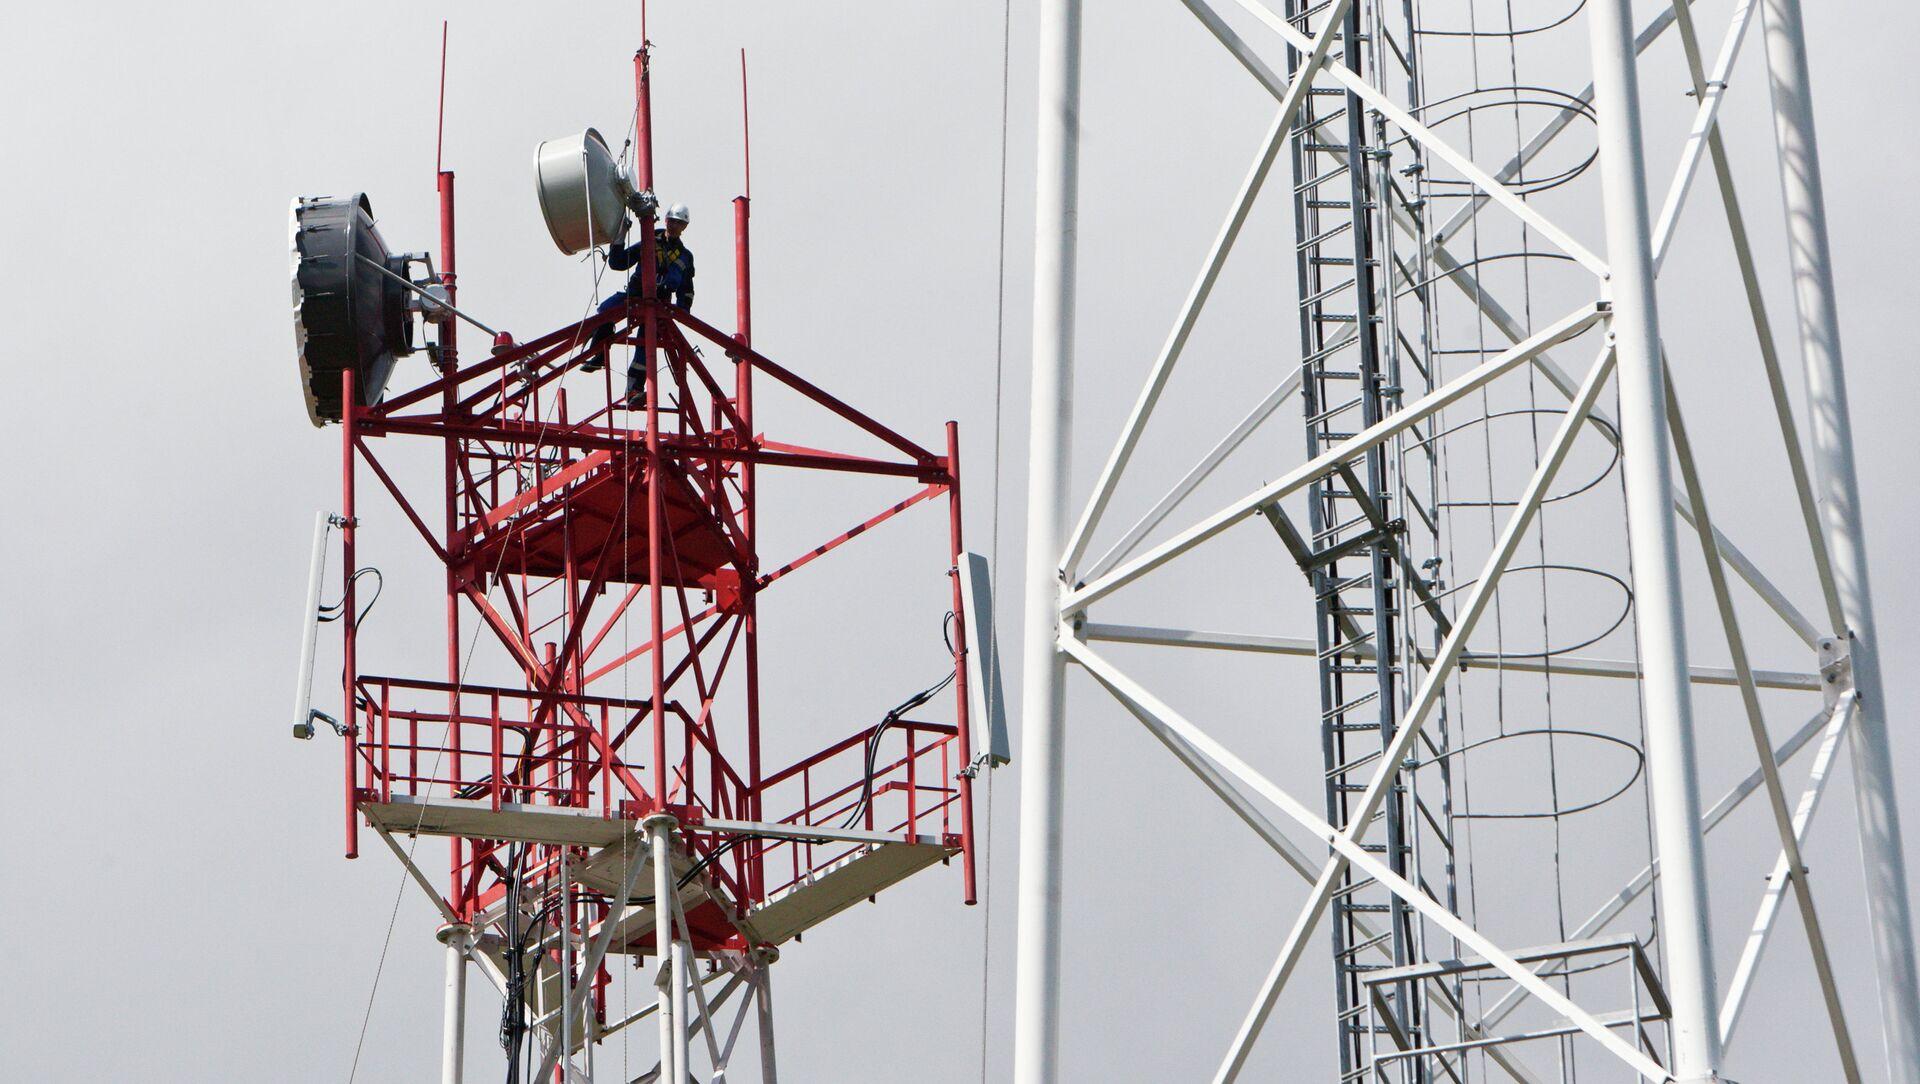 Phone Tower - Sputnik International, 1920, 30.07.2021